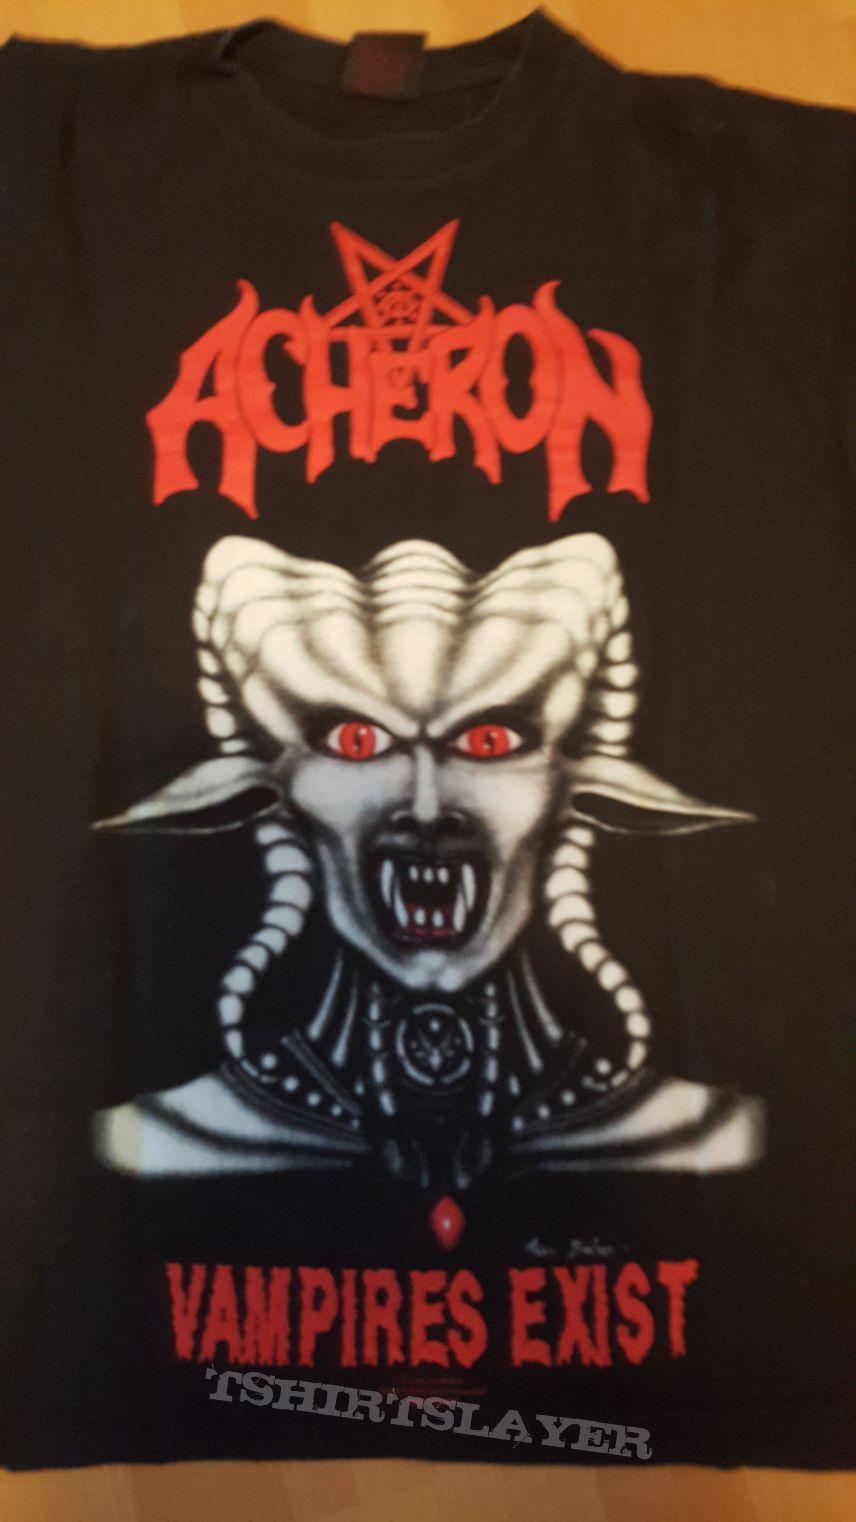 ACHERON - Vampires Exist